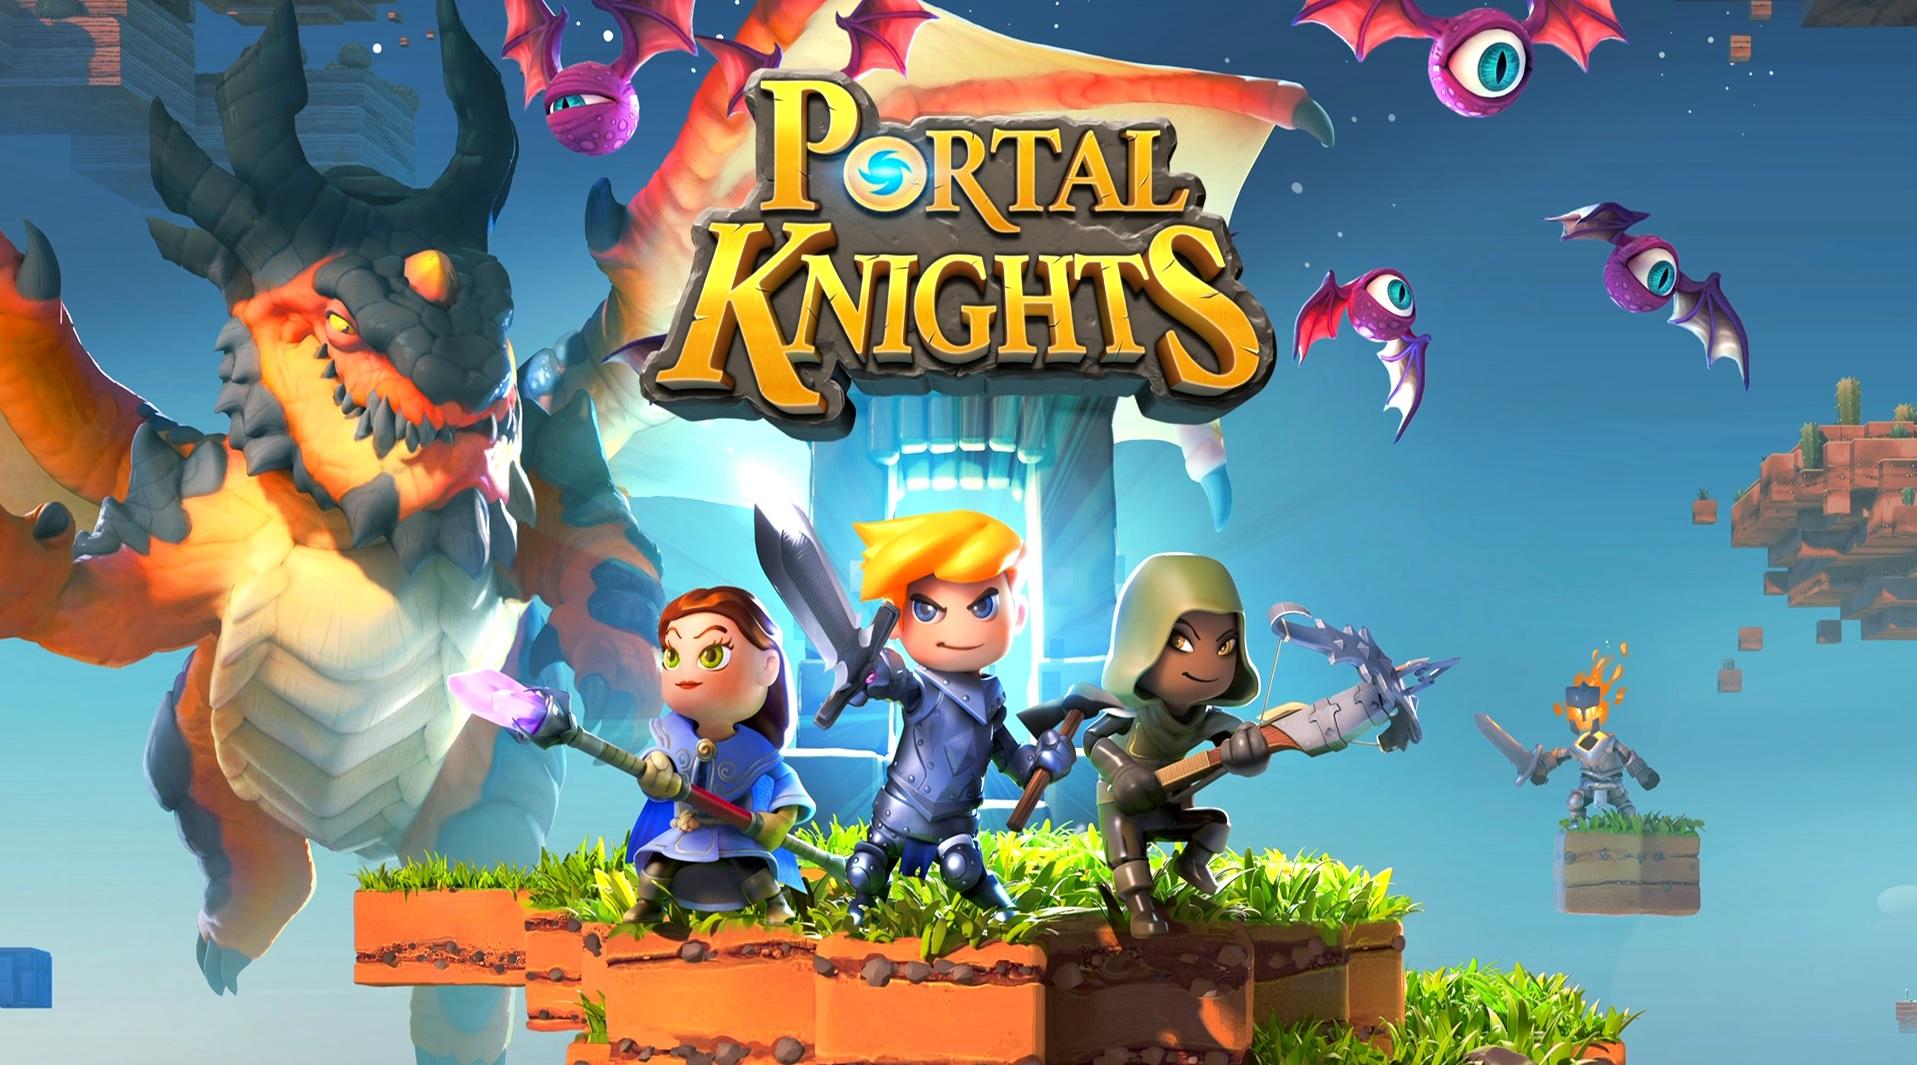 Test de Portal Knights sur Xbox One : une aventure suffisamment originale ? - Geeks and Com'